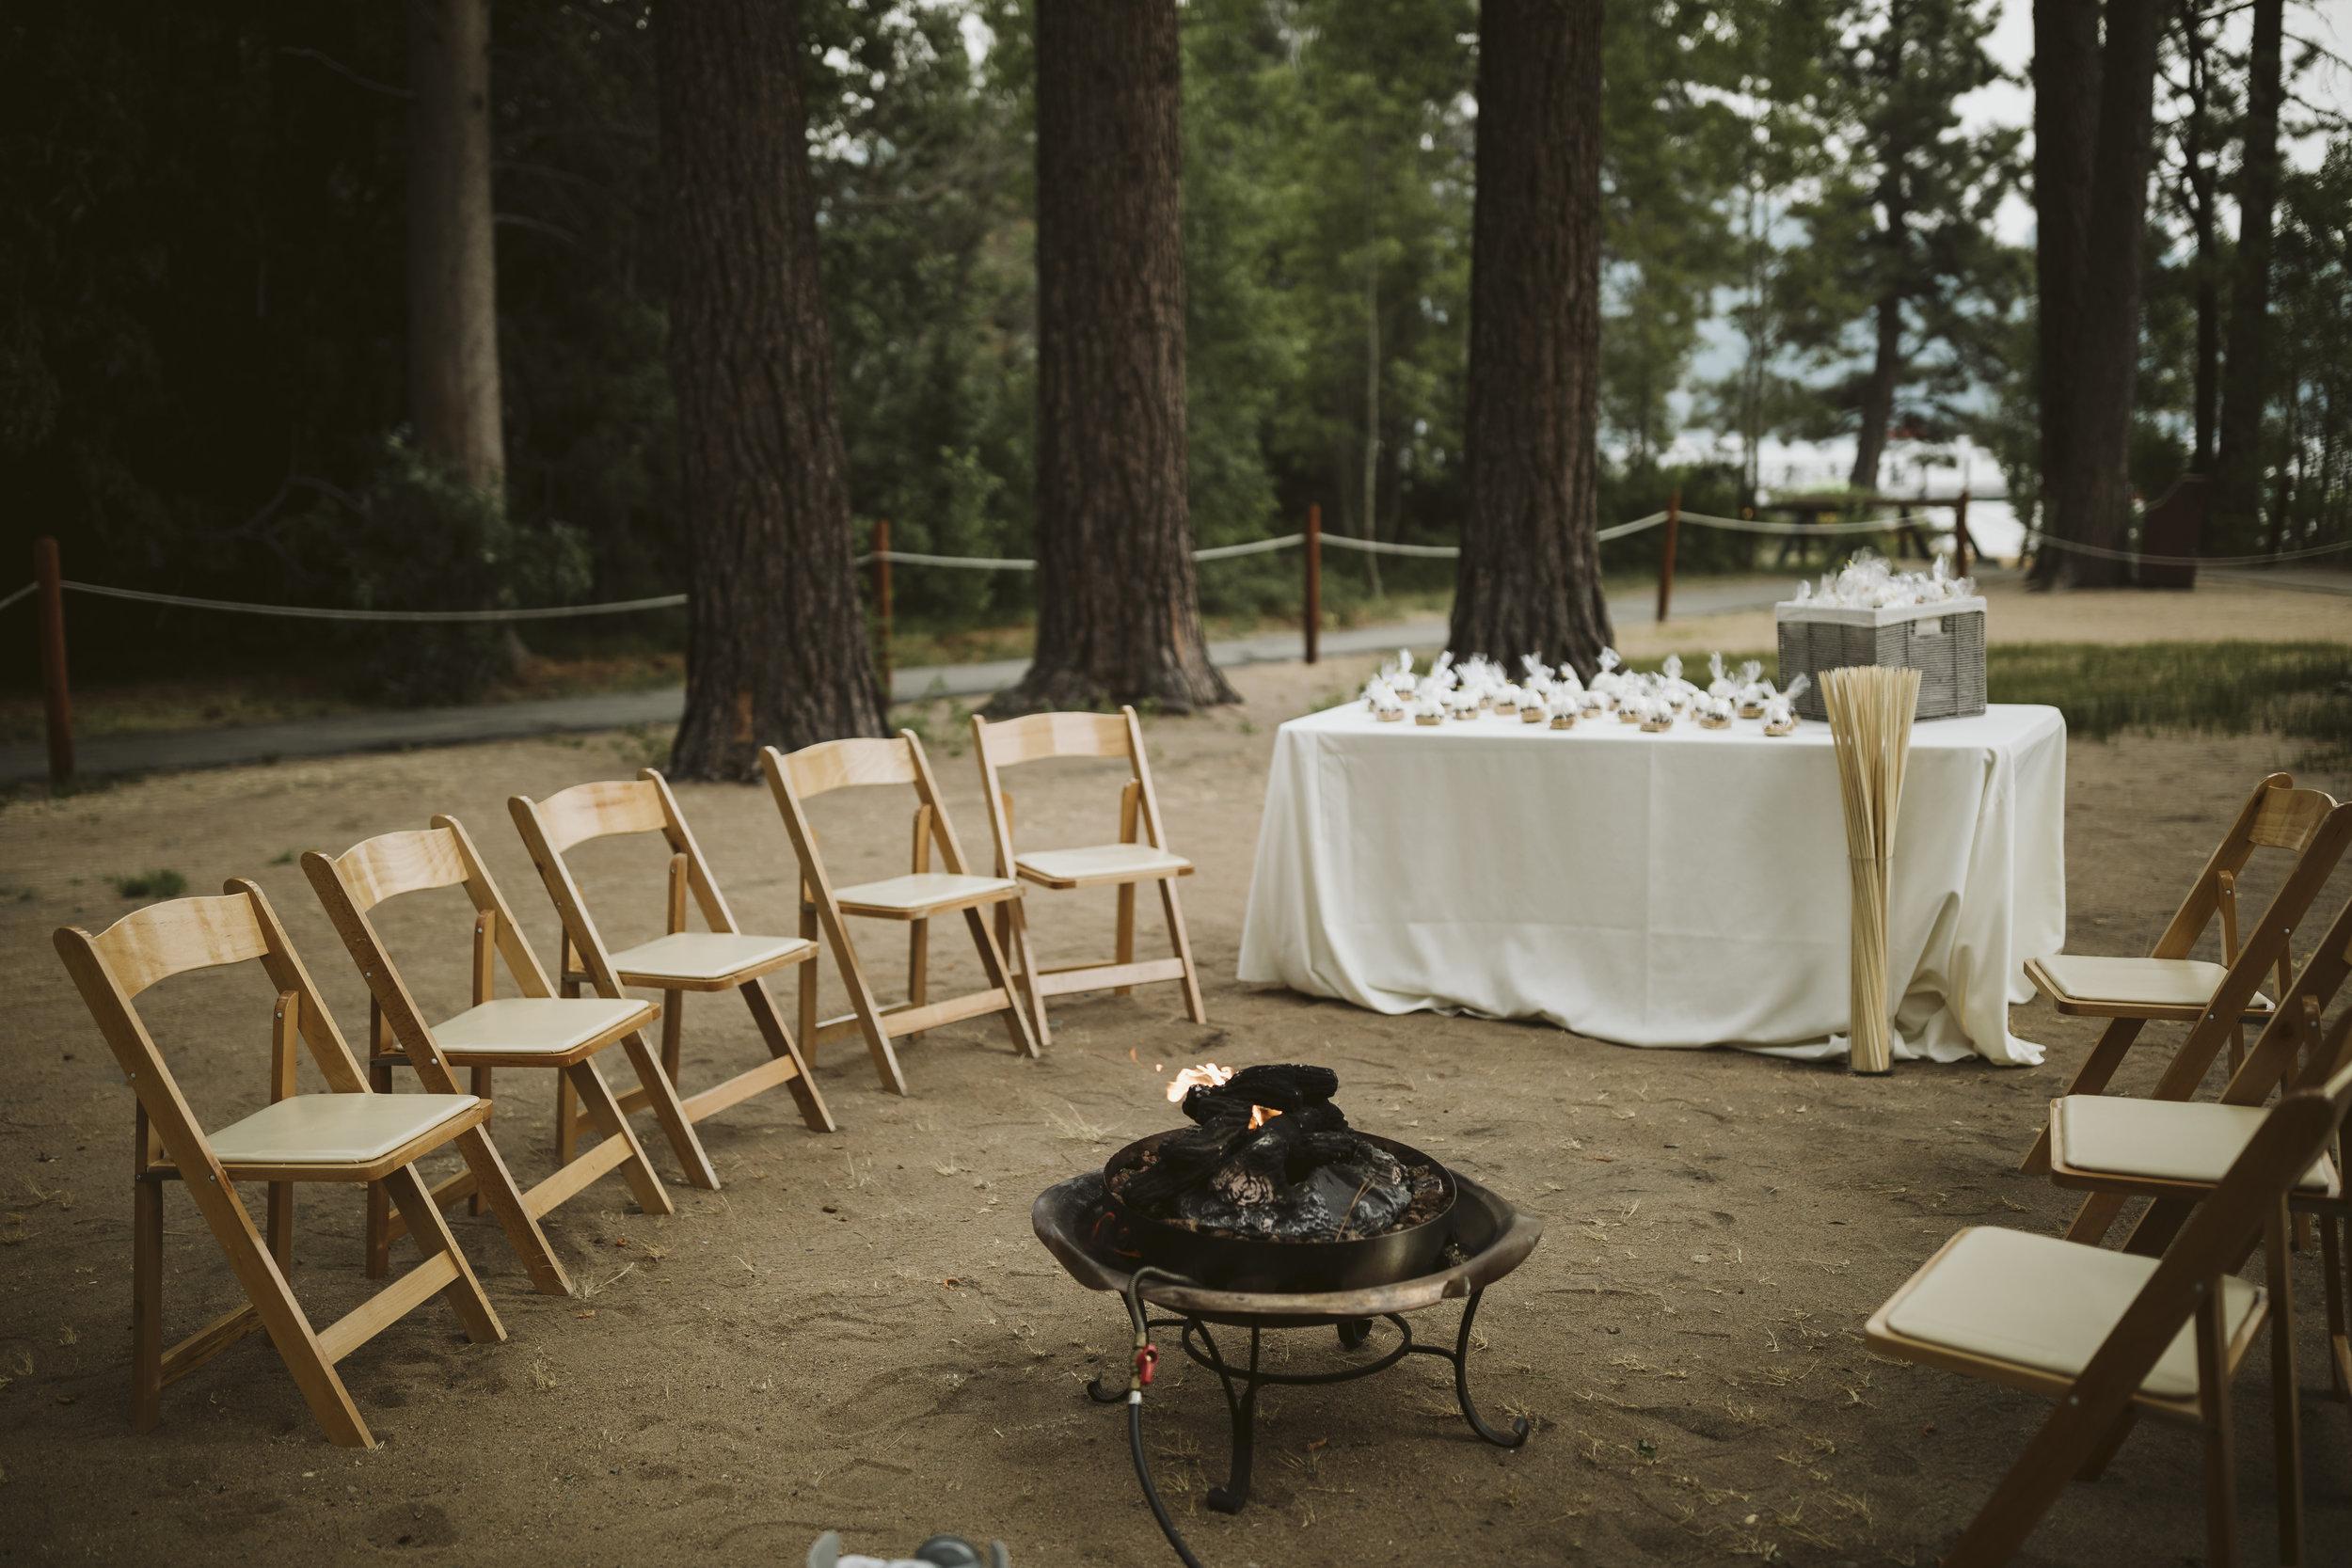 _M7A2627vild-vild photography-photography-wedding-wedding photography-tahoe-lake tahoe-lake tahoe wedding photographer-nevada wedding photographer-mountain wedding.jpg